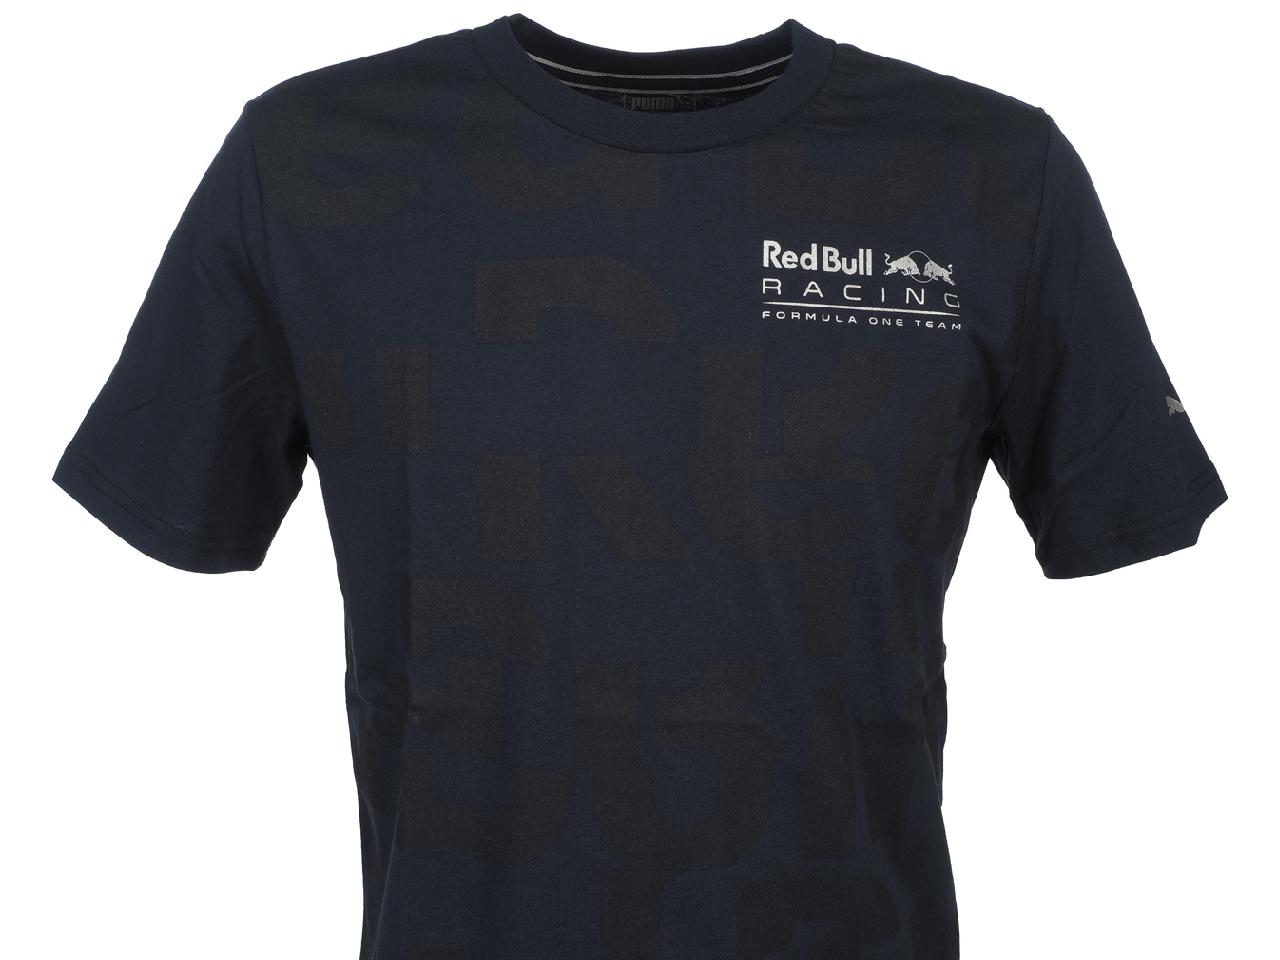 Short-Sleeve-T-Shirt-Puma-Rbr-Race-Navy-Mc-Tee-Blue-44570-New thumbnail 2